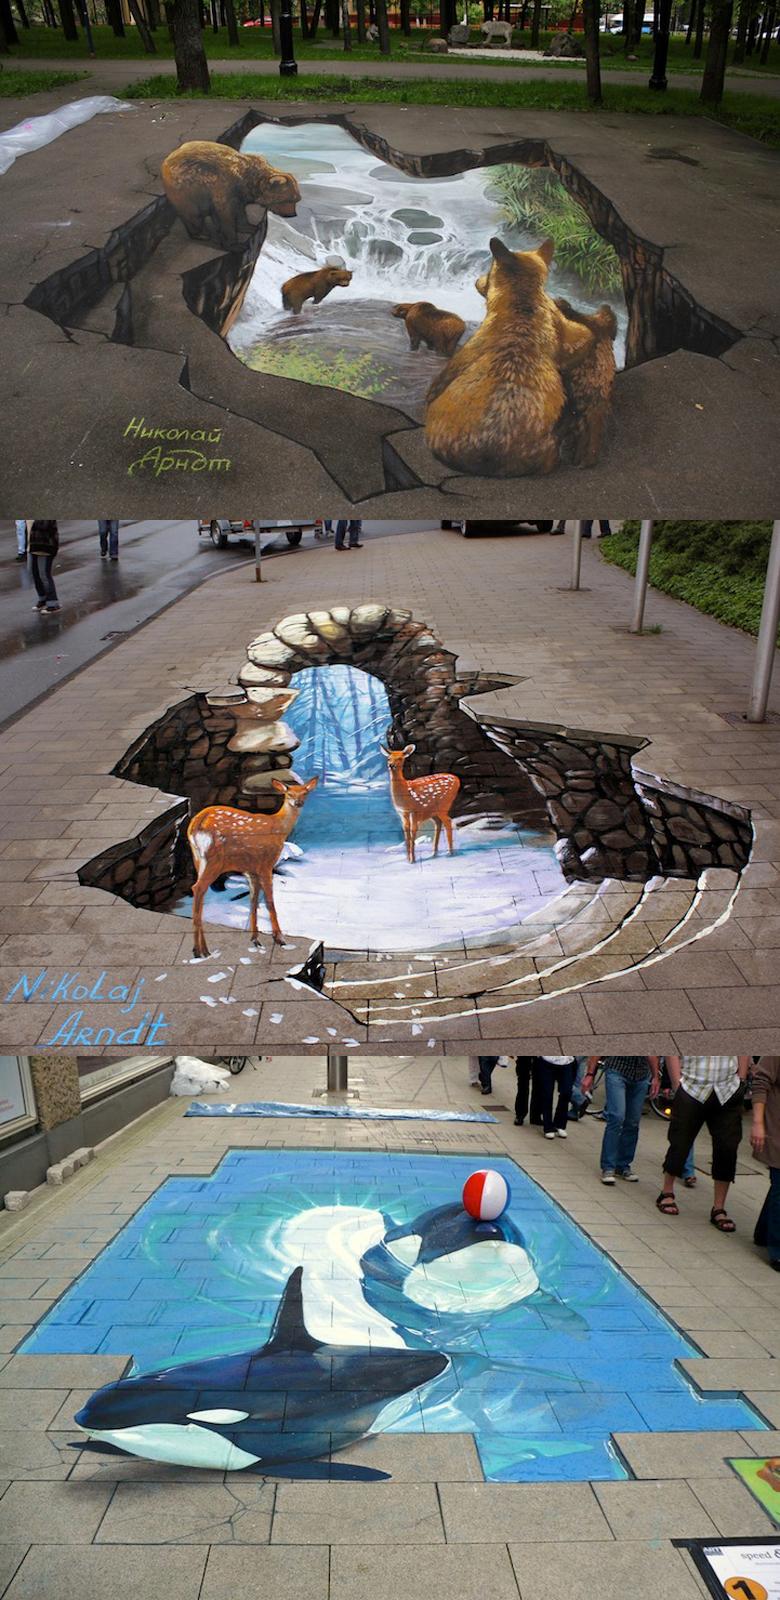 Nikolaj+Arndt+street+art.jpg